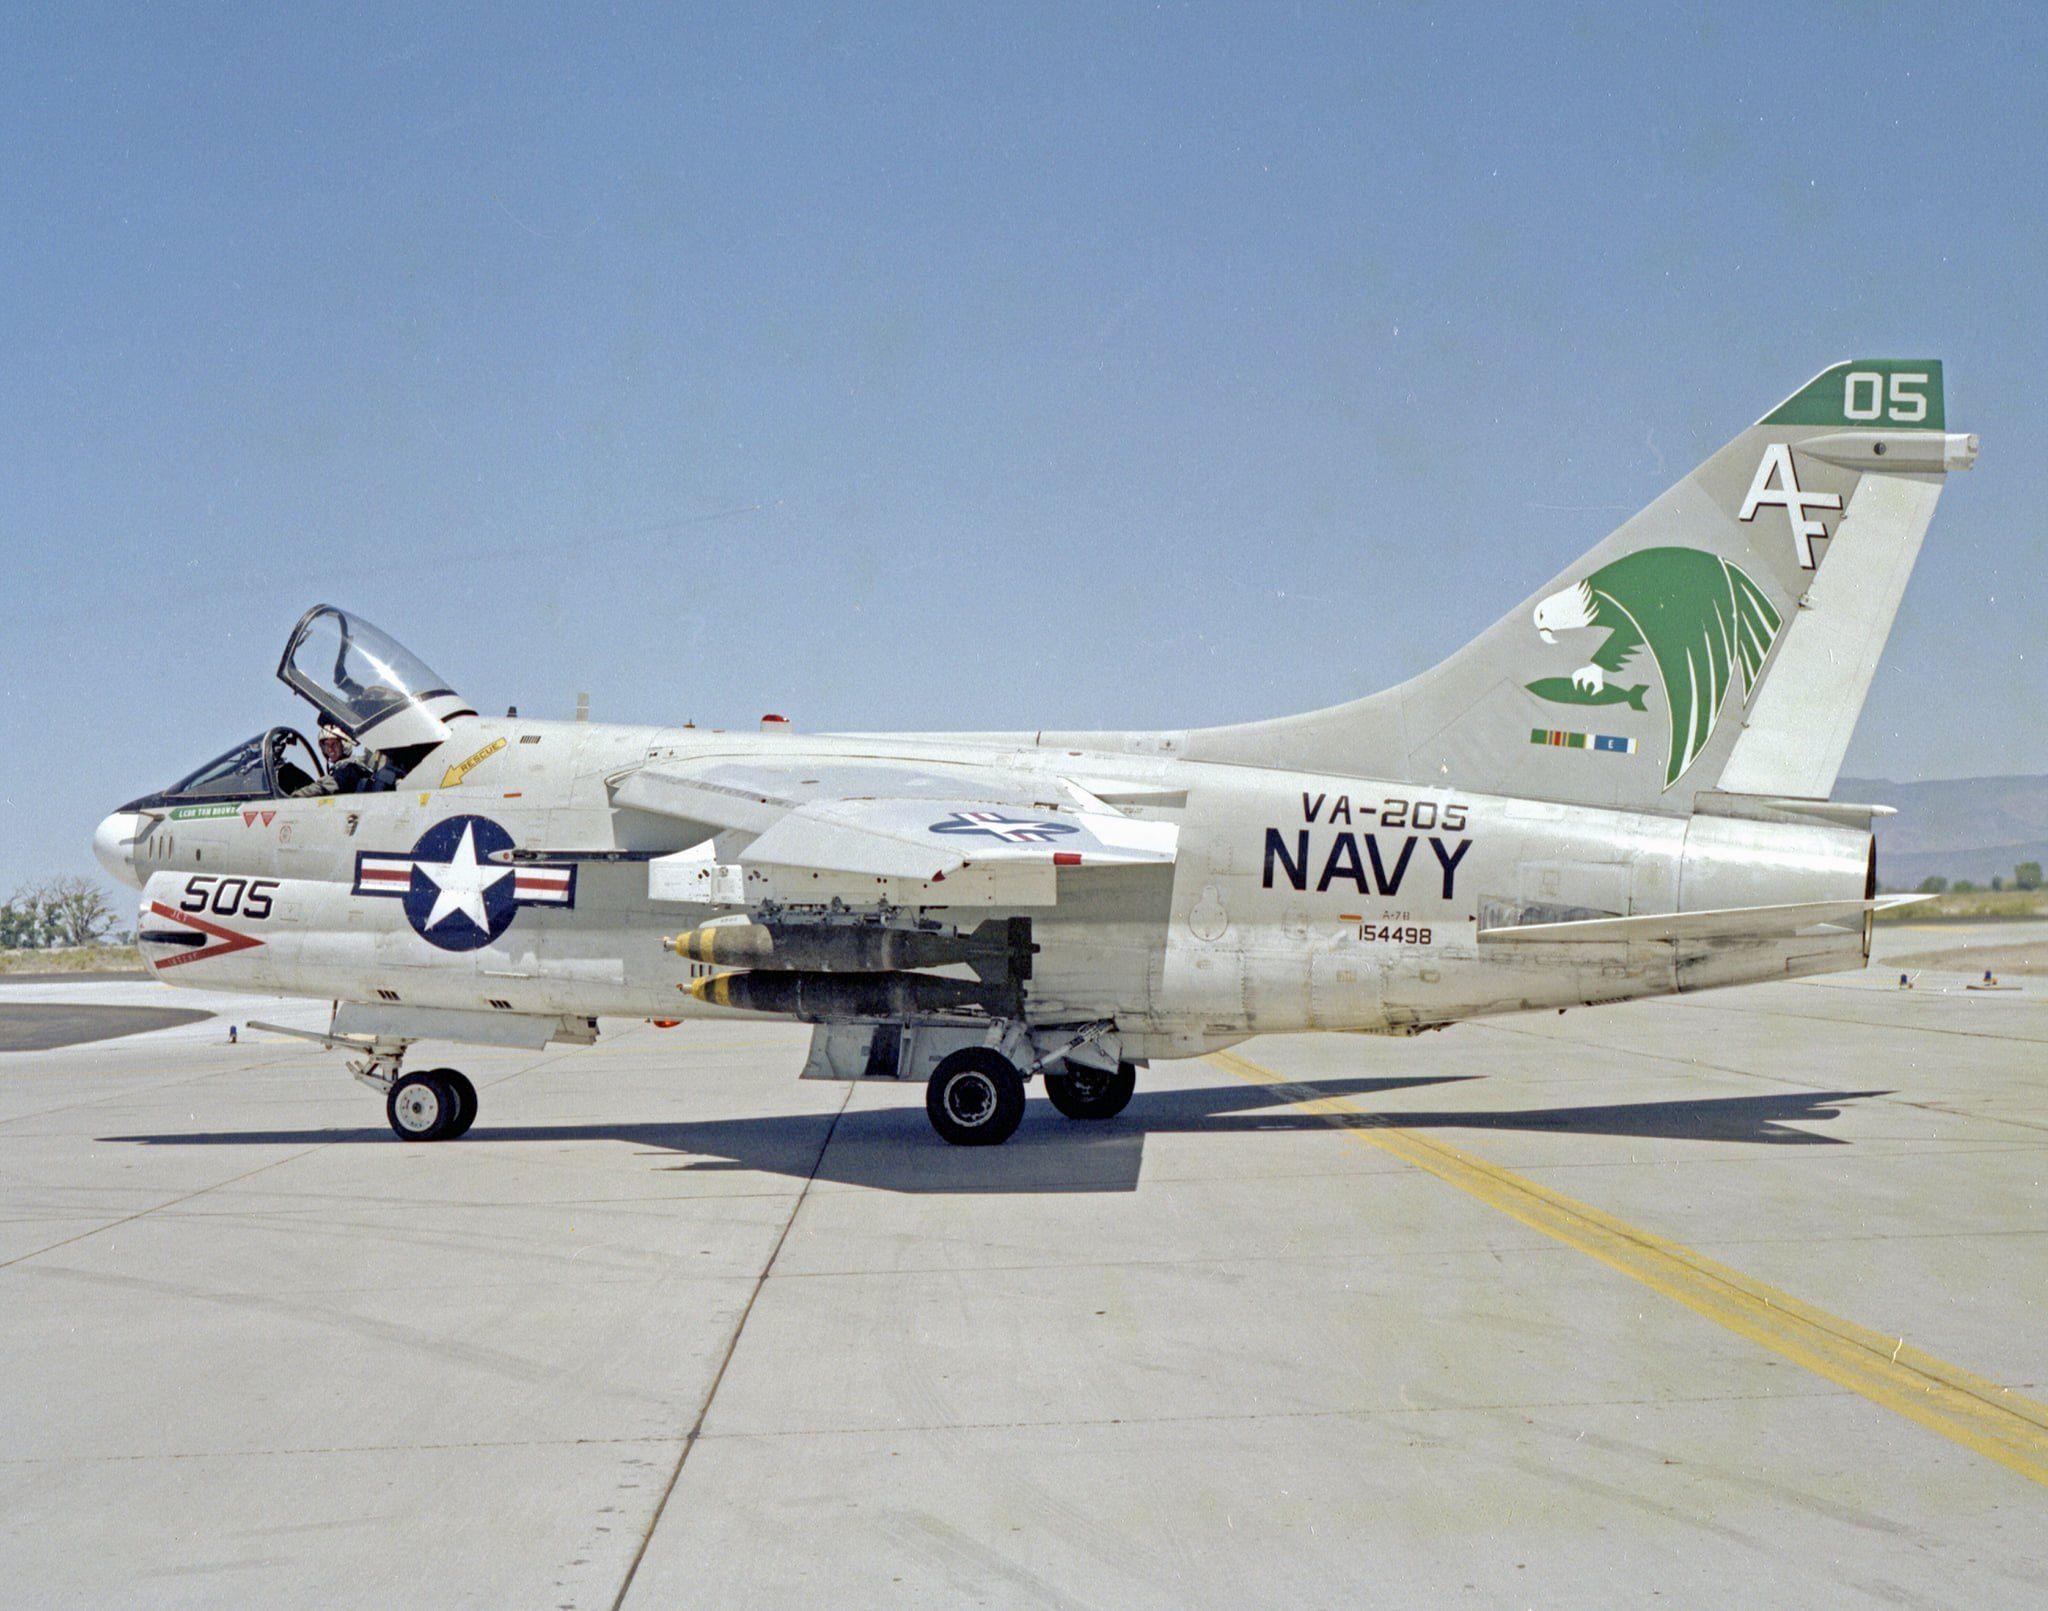 A7B VA205 Green Falcons, NAS Fallon (With images) Usaf